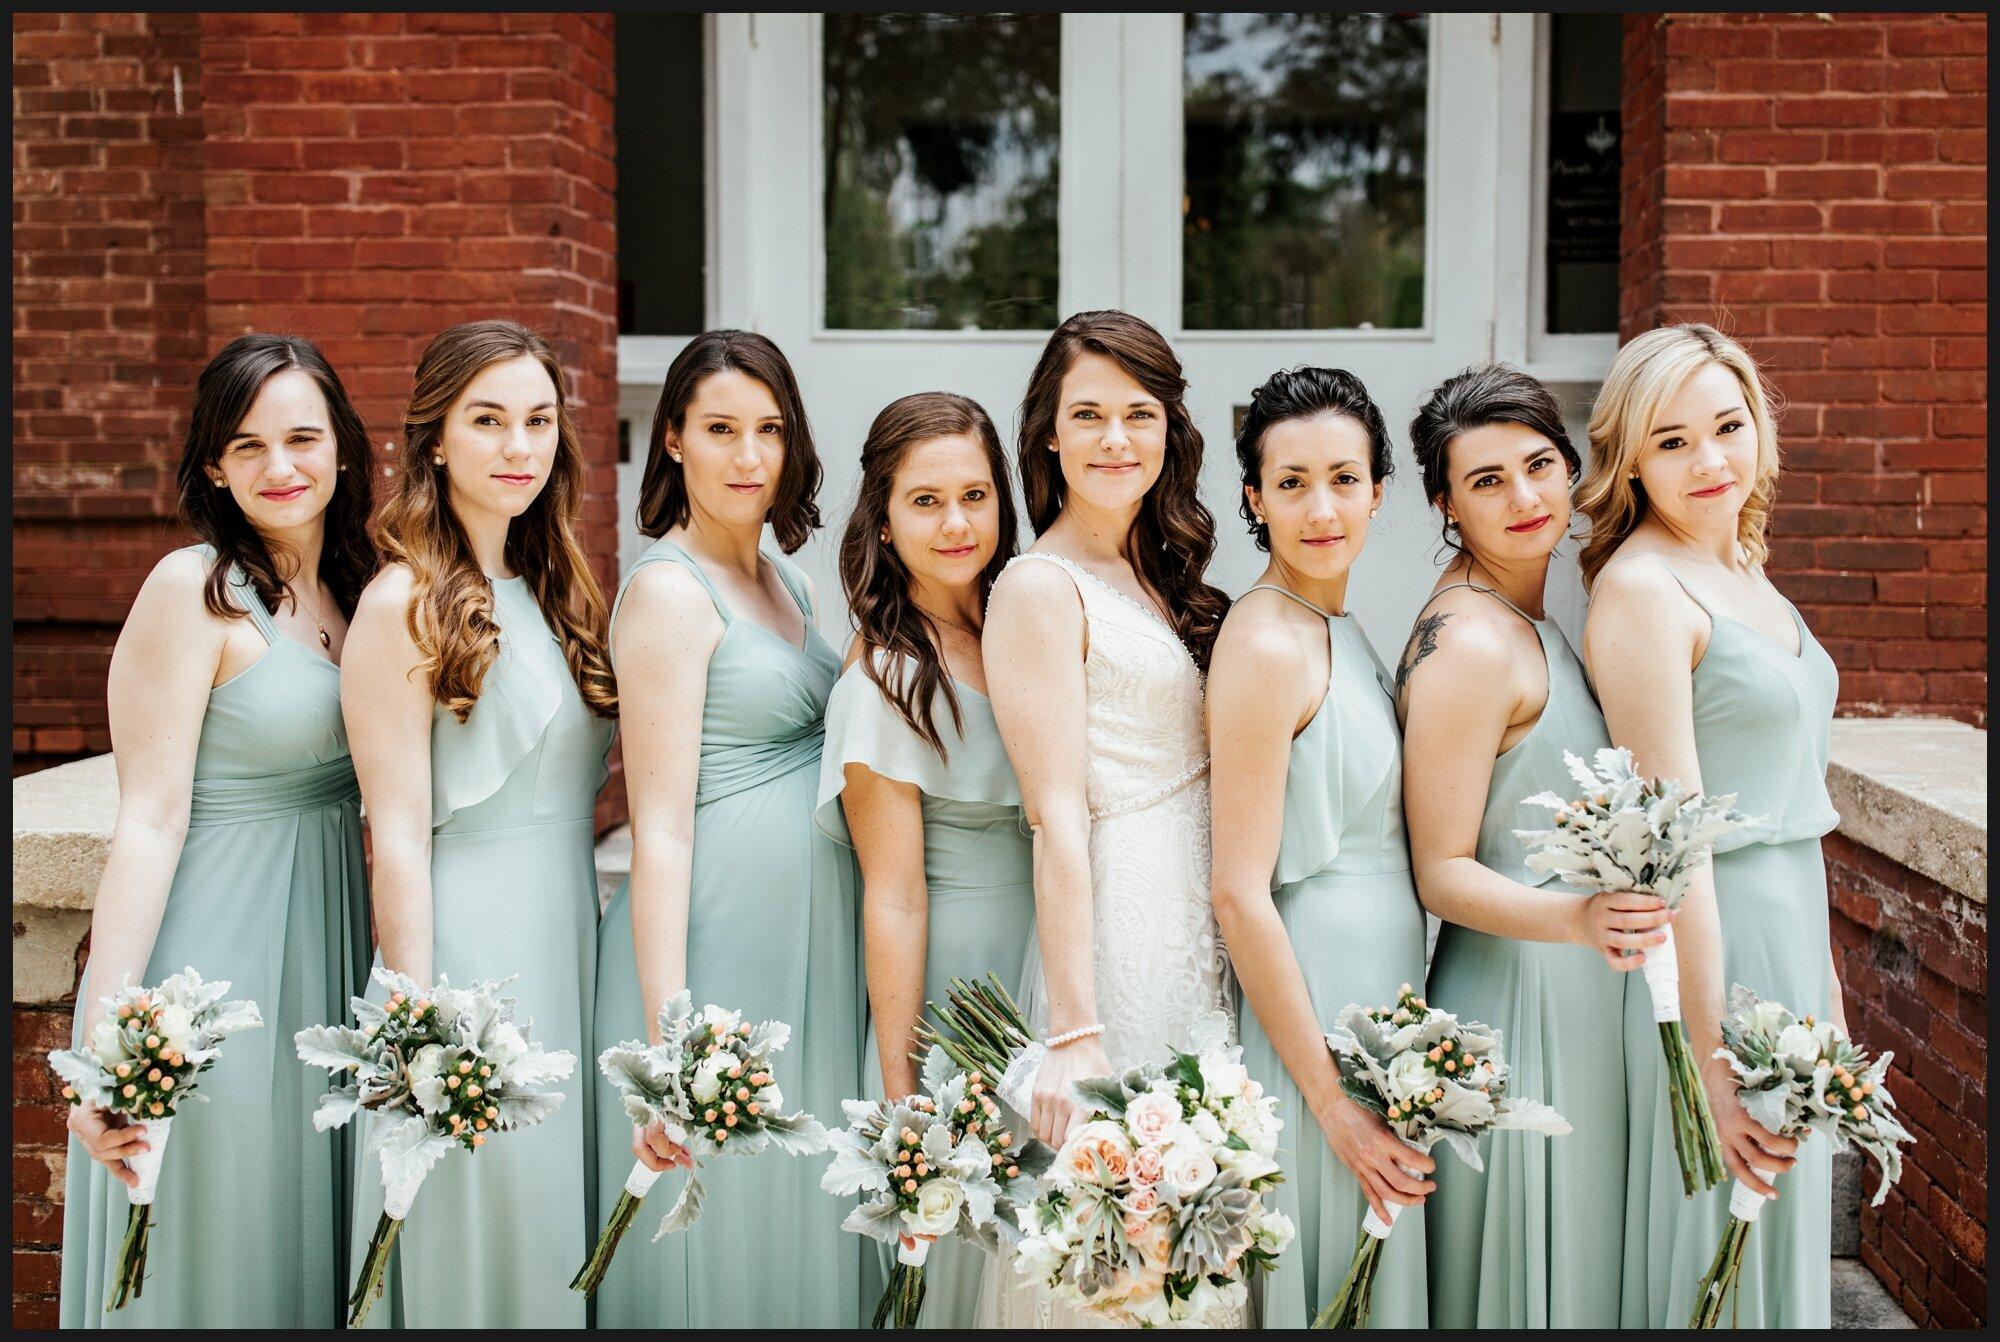 Orlando-Wedding-Photographer-destination-wedding-photographer-florida-wedding-photographer-hawaii-wedding-photographer_0660.jpg